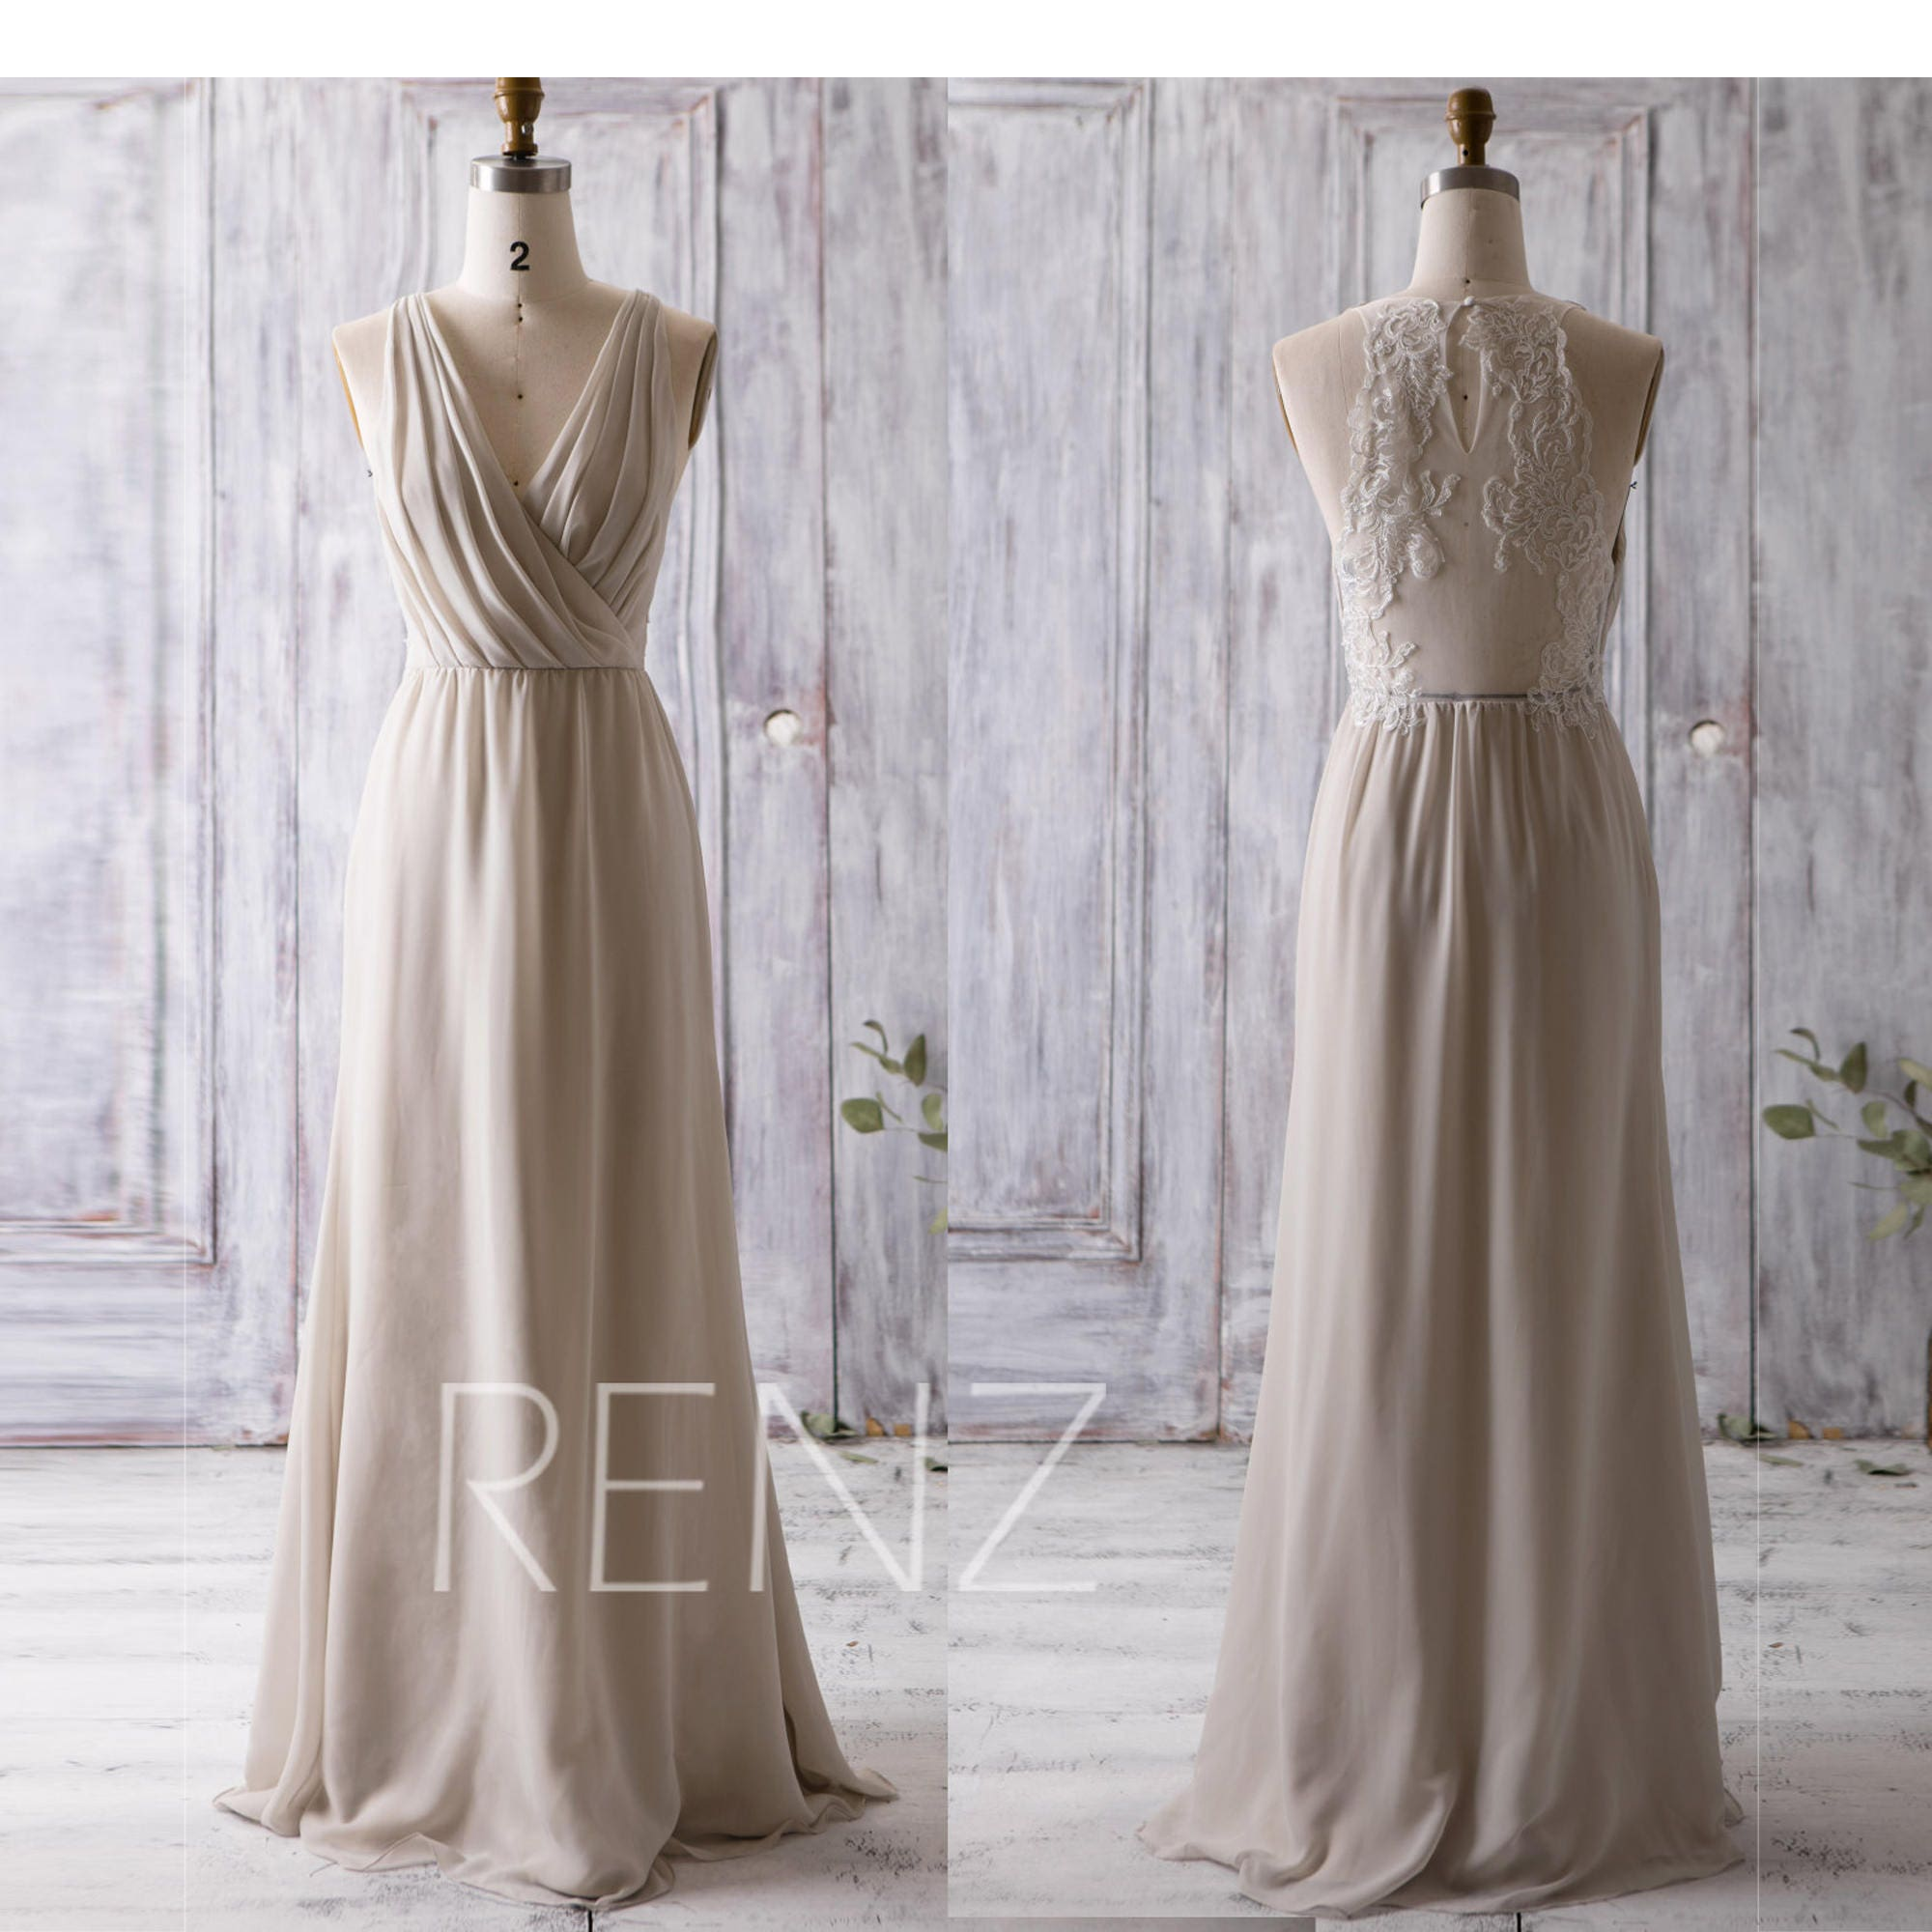 5a6e66a8c2 Beige Chiffon Bridesmaid Dresses